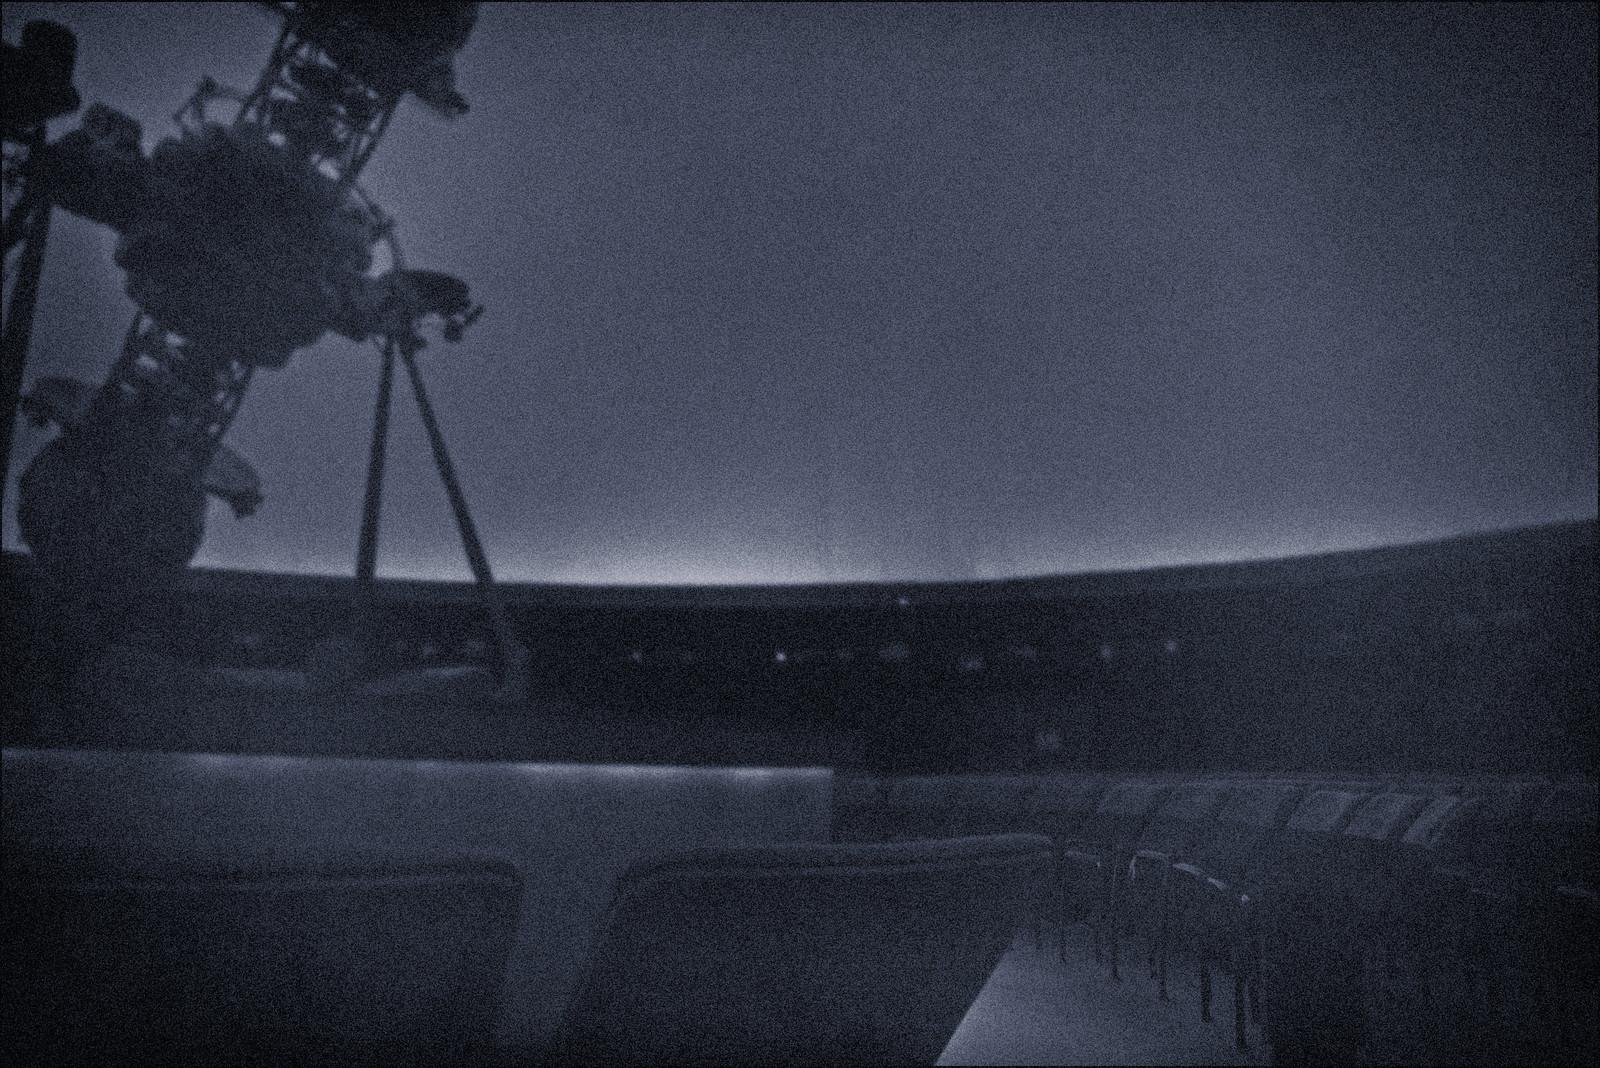 2007planetariumfrblue